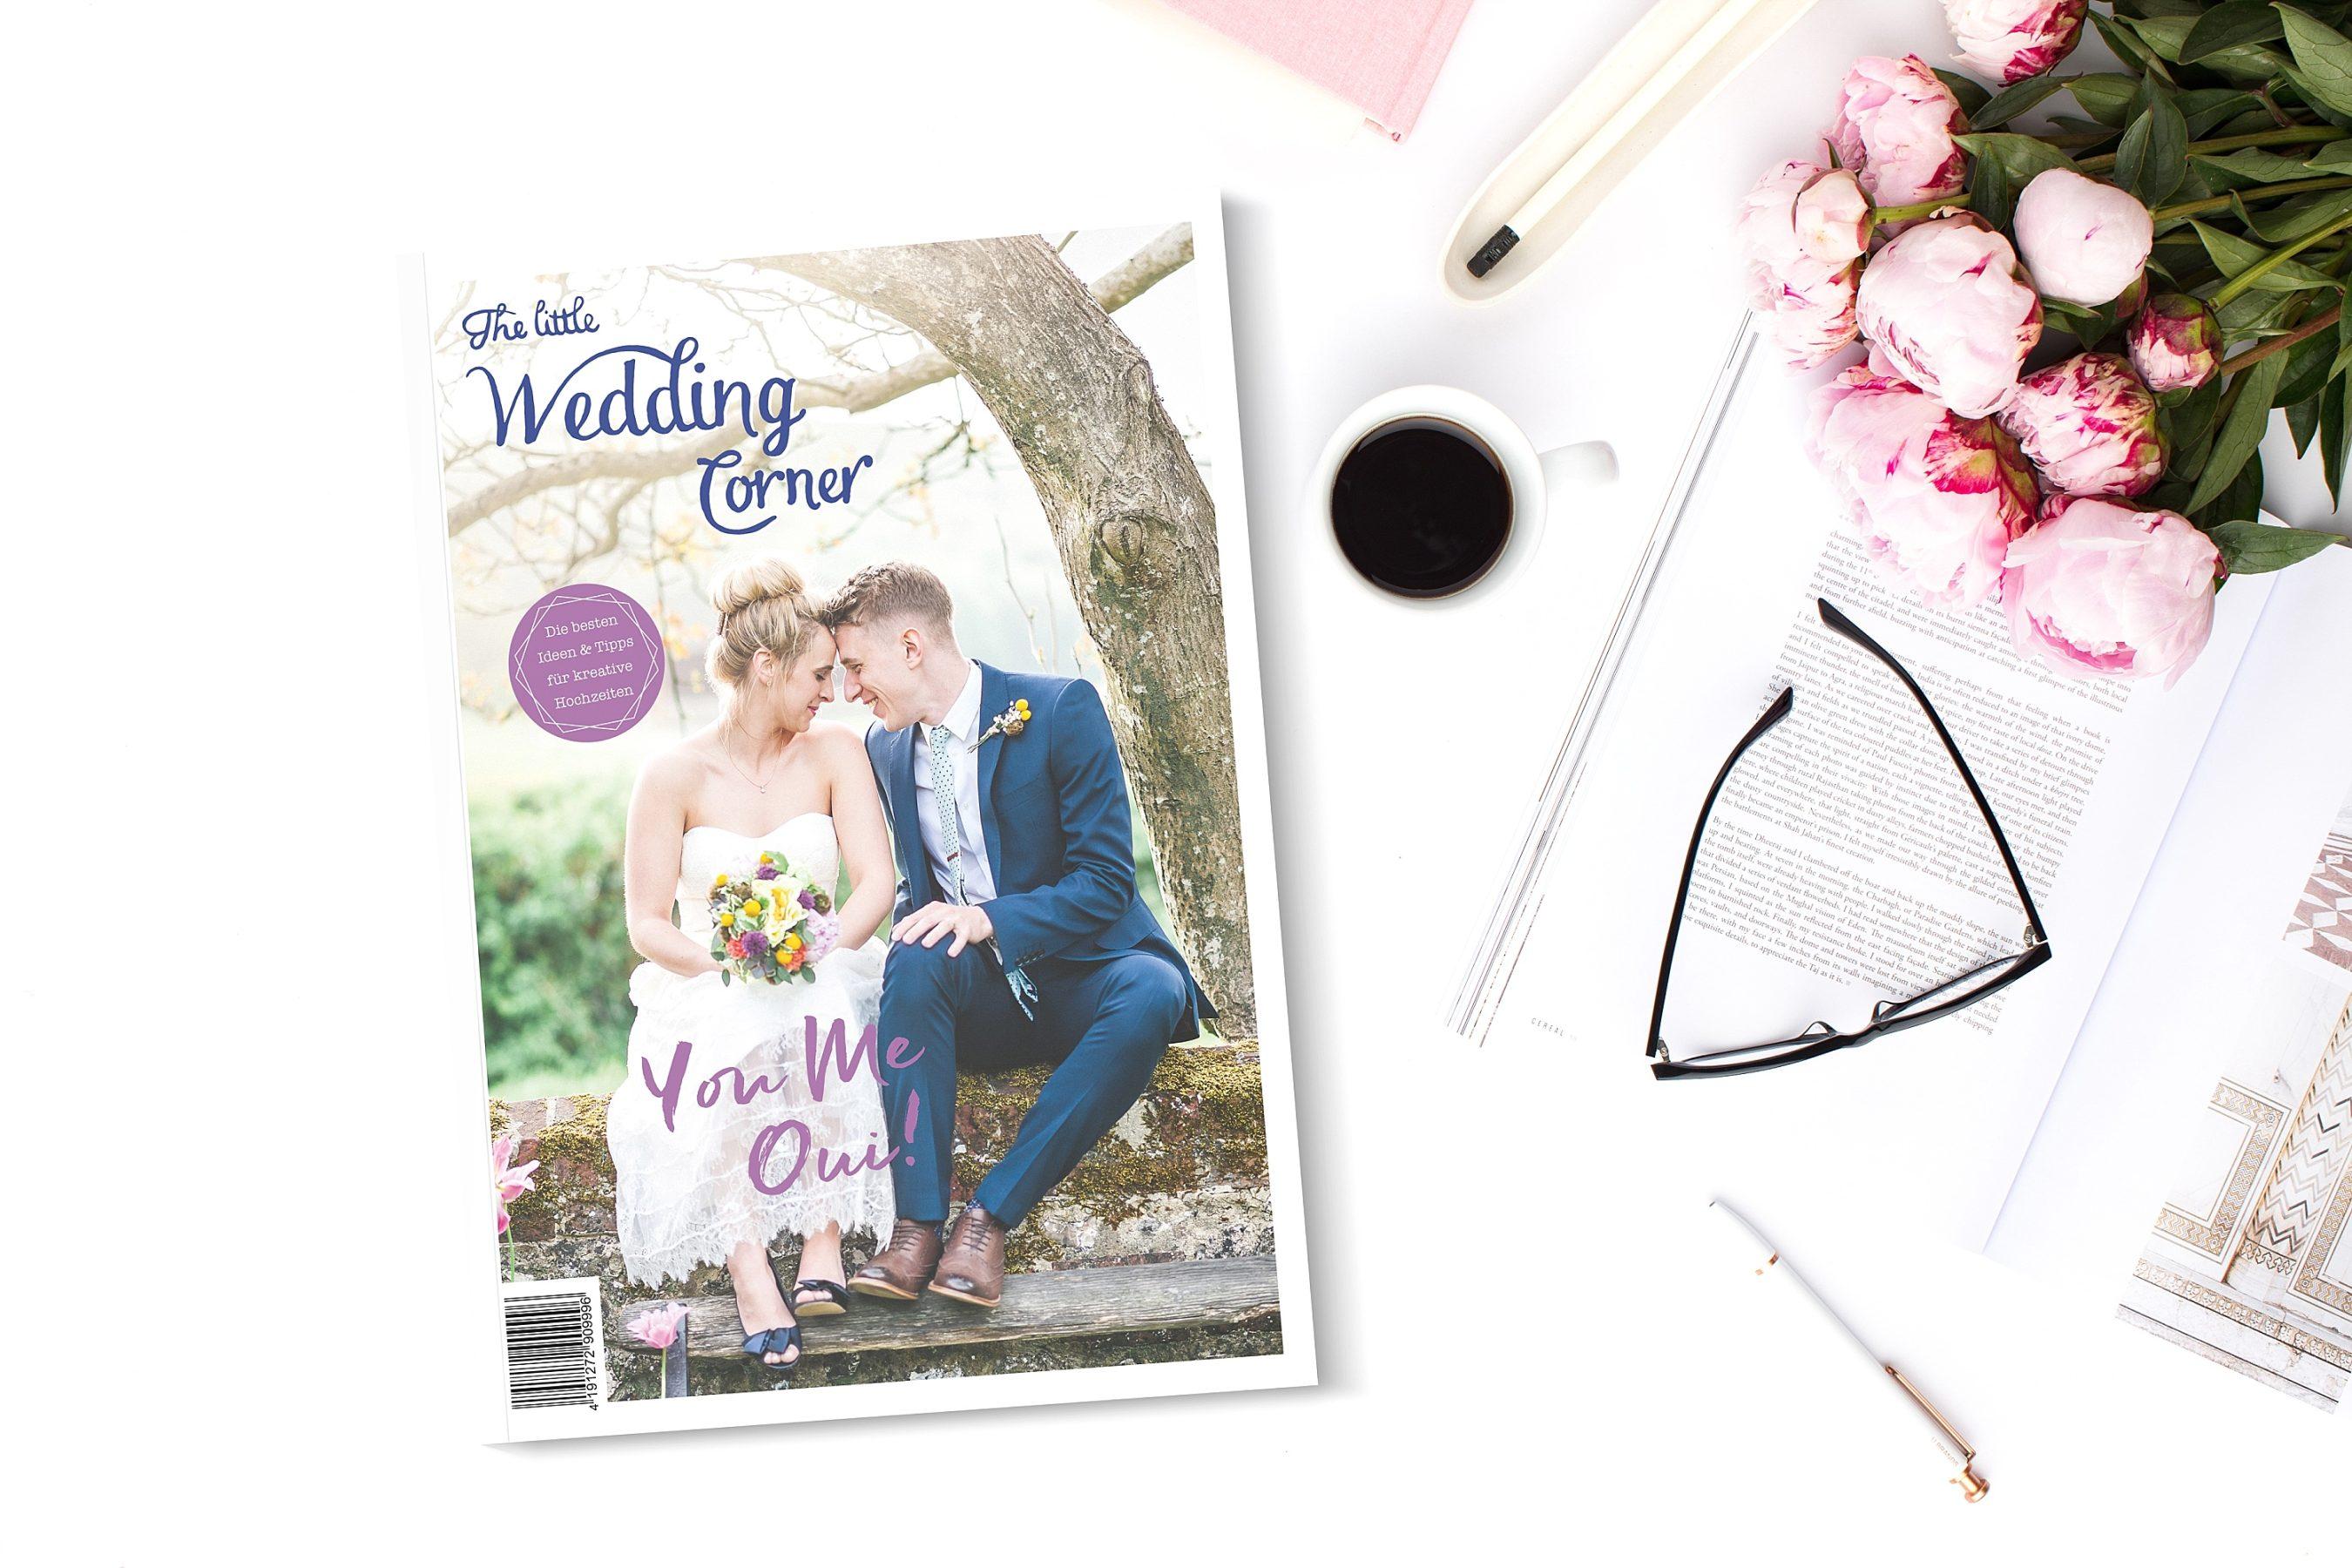 Hochzeitsmagazin 2018, Hochzeitsmagazin, Hochzeitsbuch